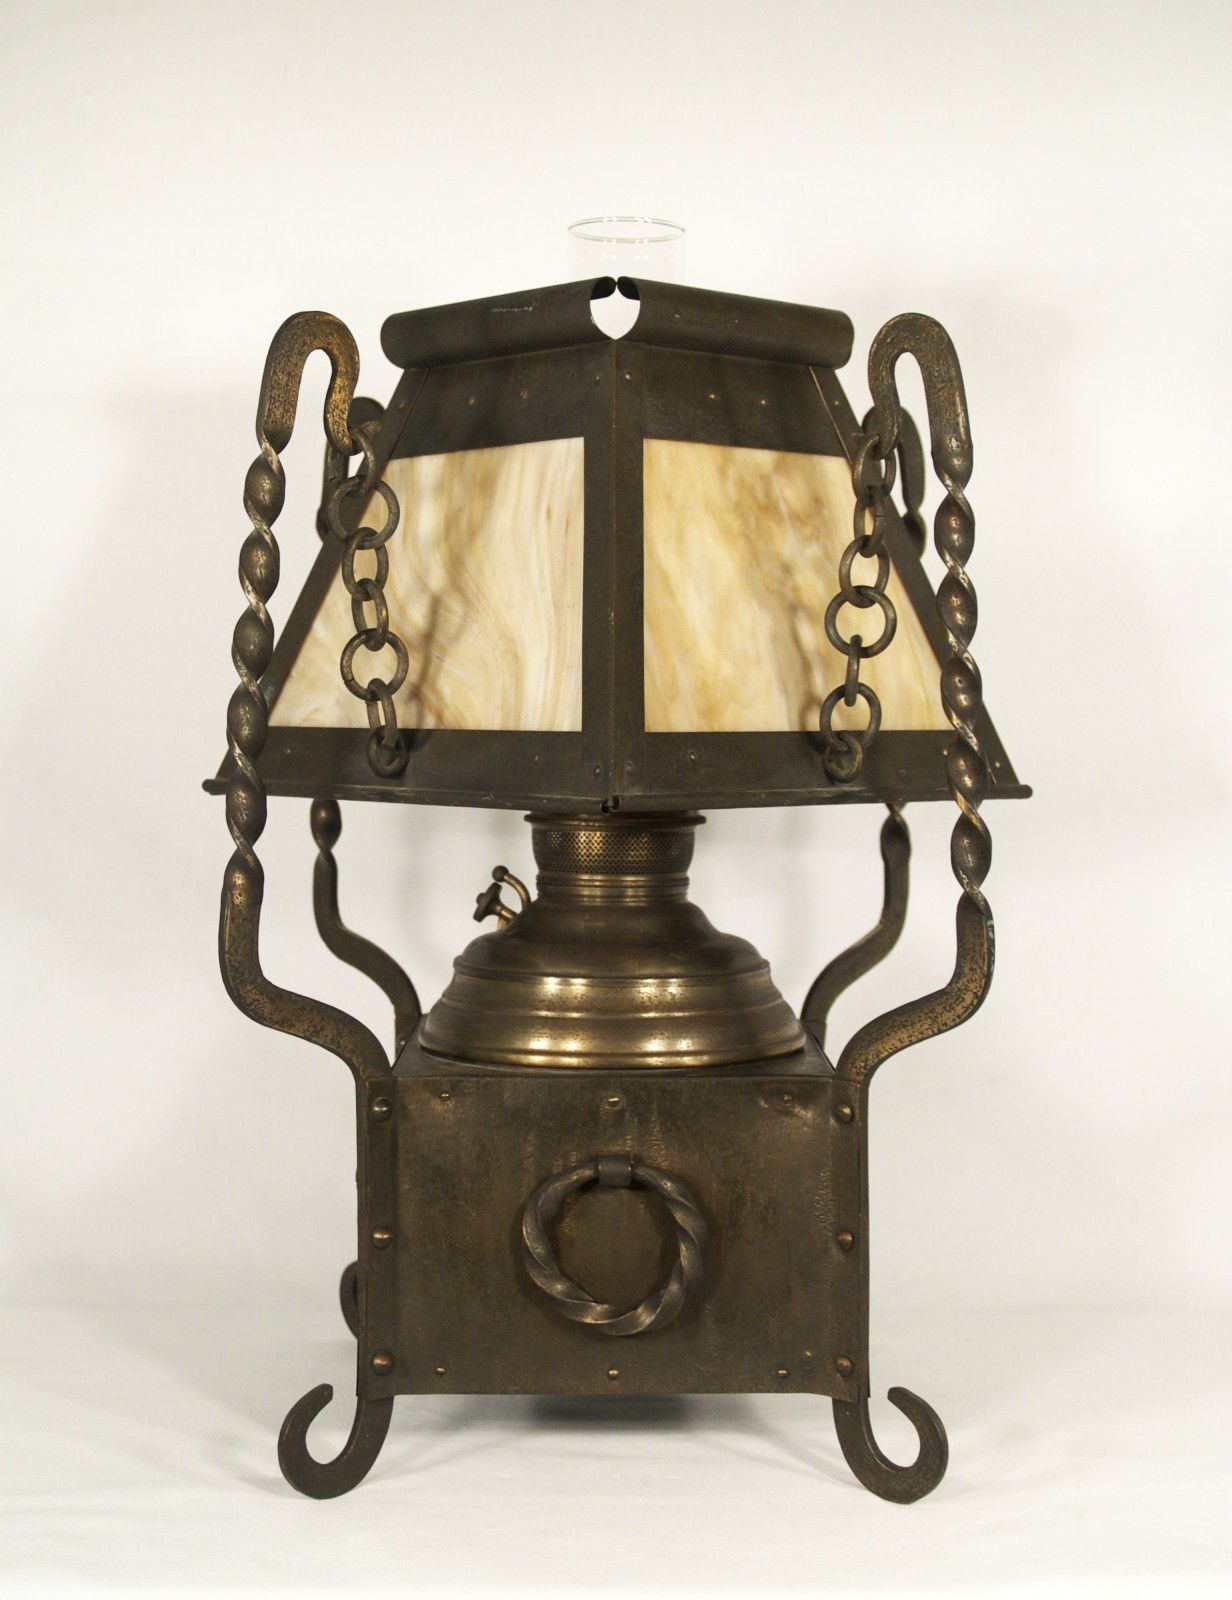 Park Art My WordPress Blog_Arts And Crafts Lamps Antique